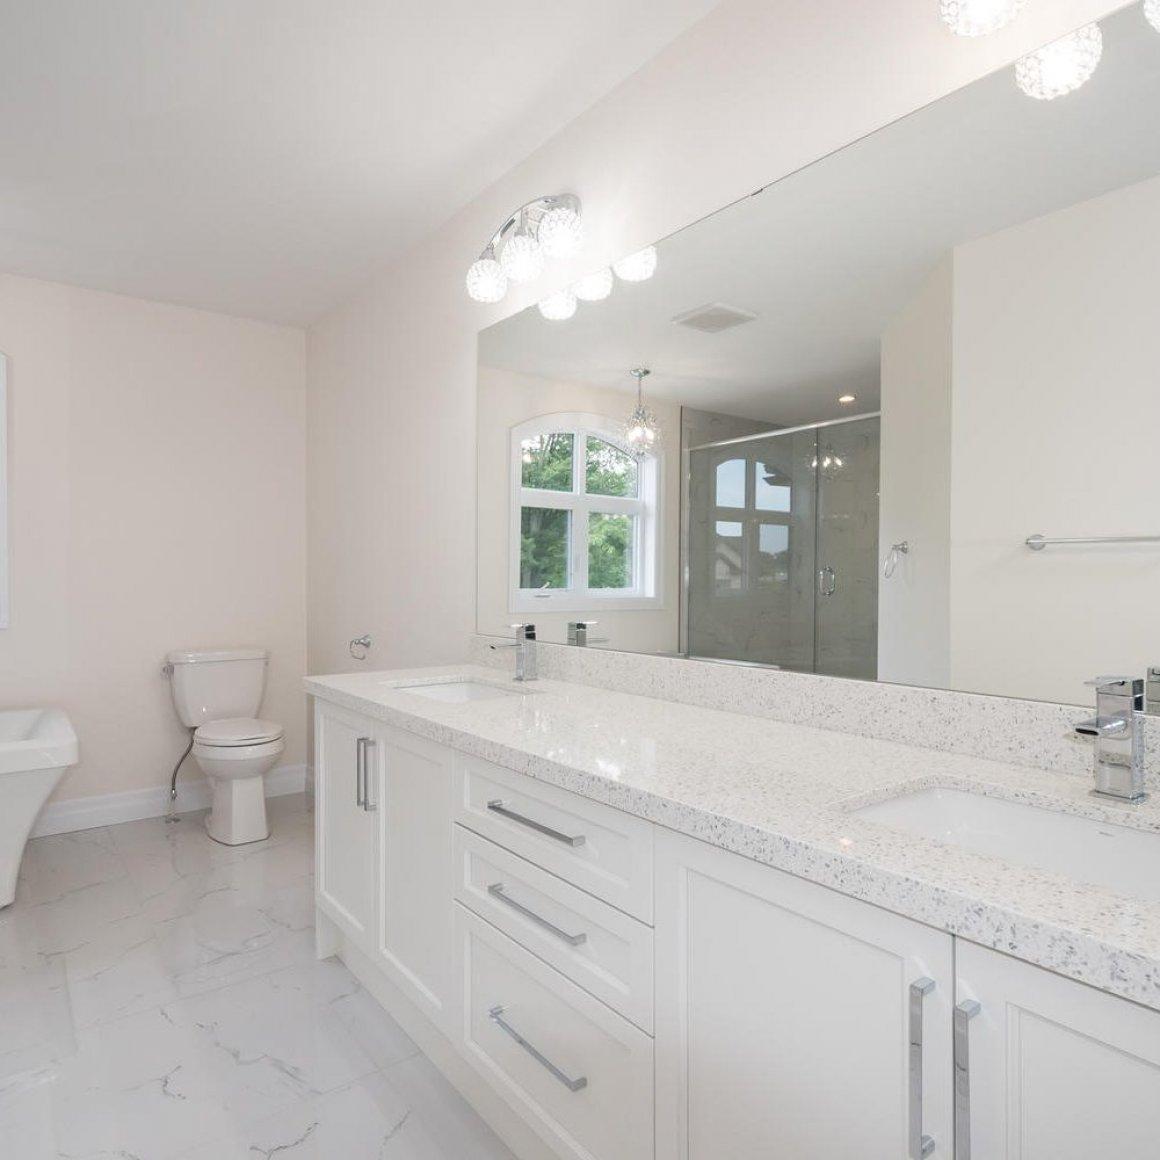 Bathroom design London ON, new bathroom ideas, bathroom designers